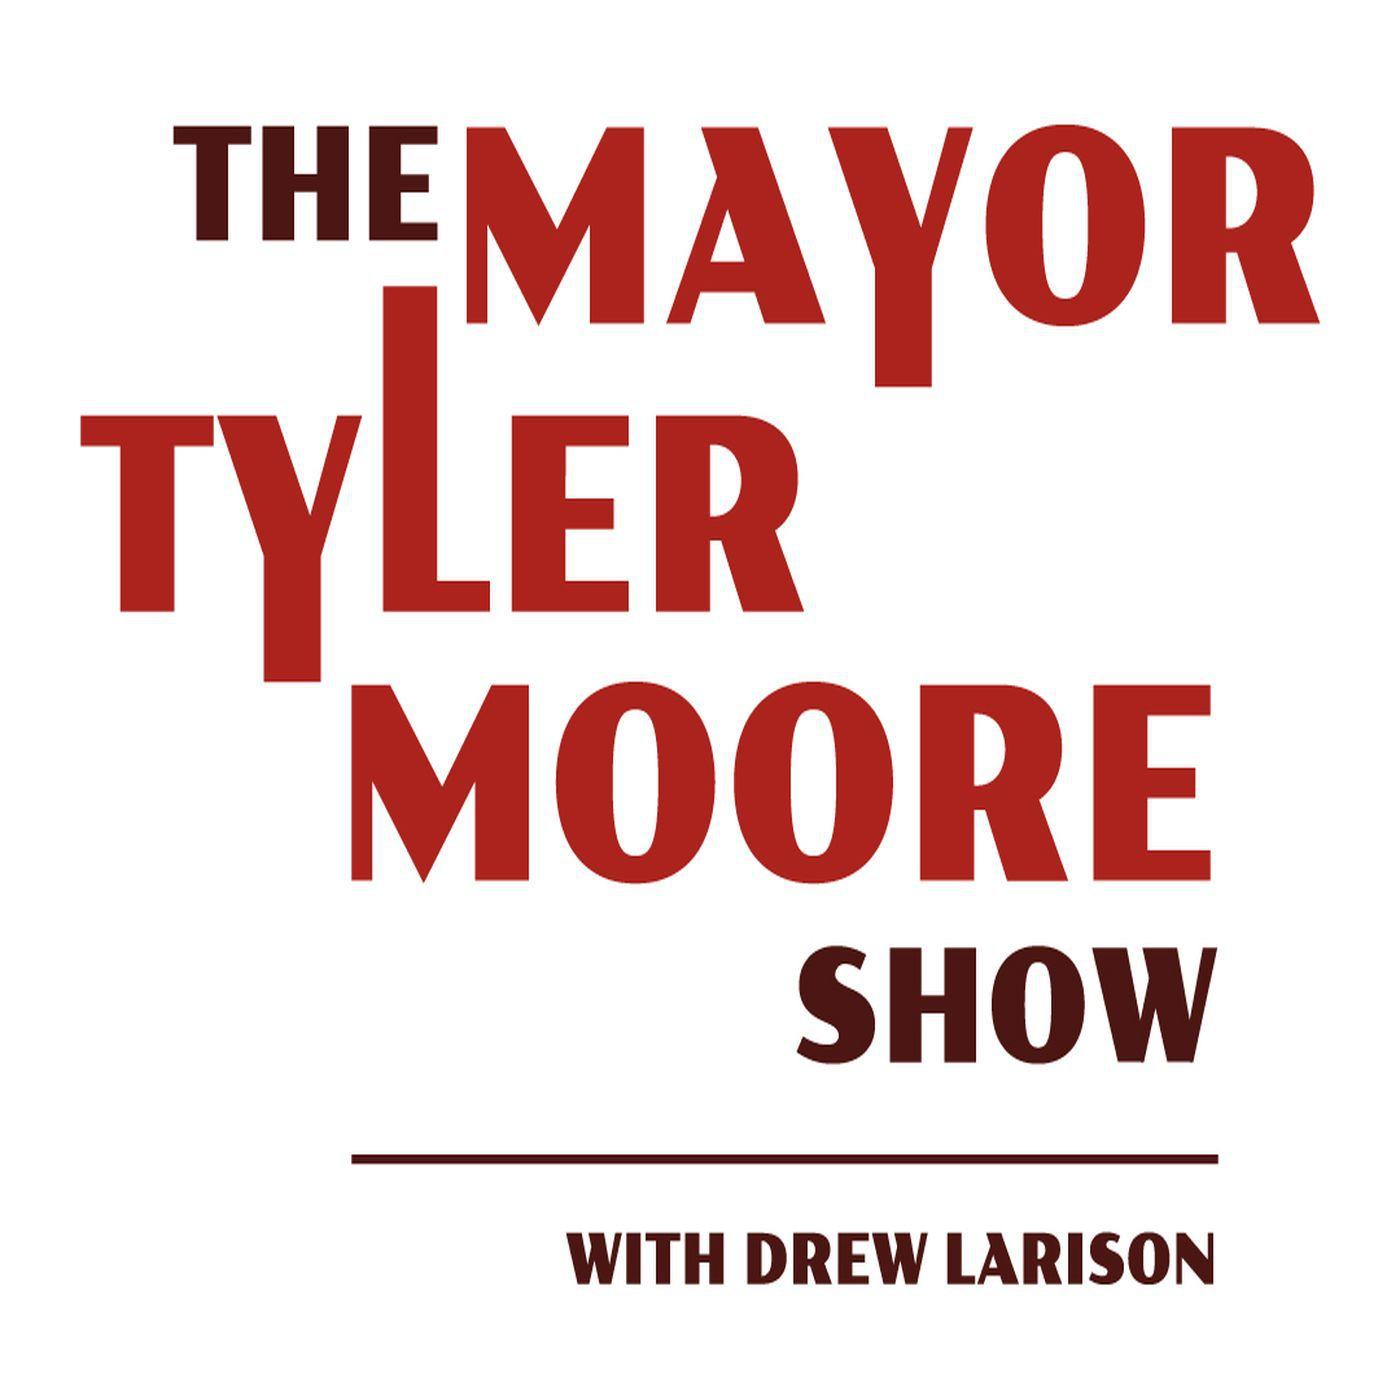 The Mayor Tyler Moore Show With Drew Larison